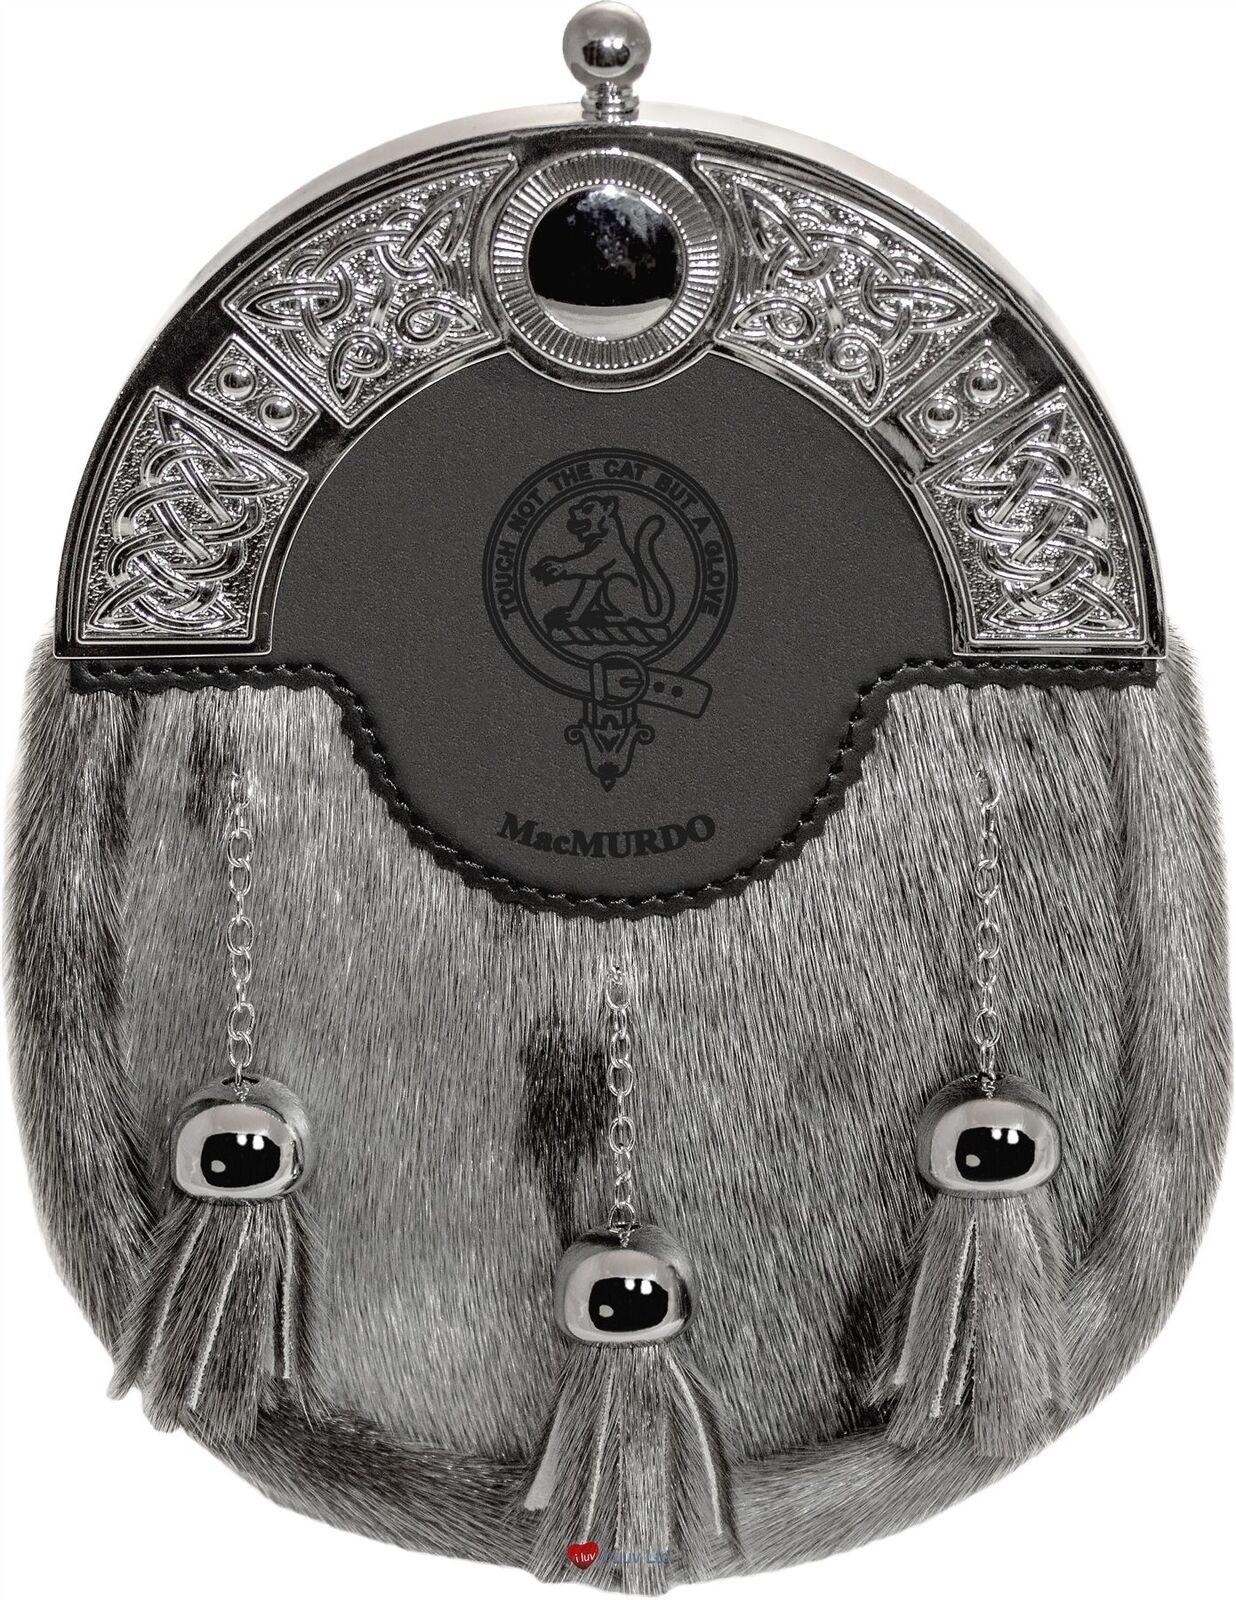 MacMurdo Dress Sporran 3 Tassels Studded Celtic Arch Scottish Clan Crest